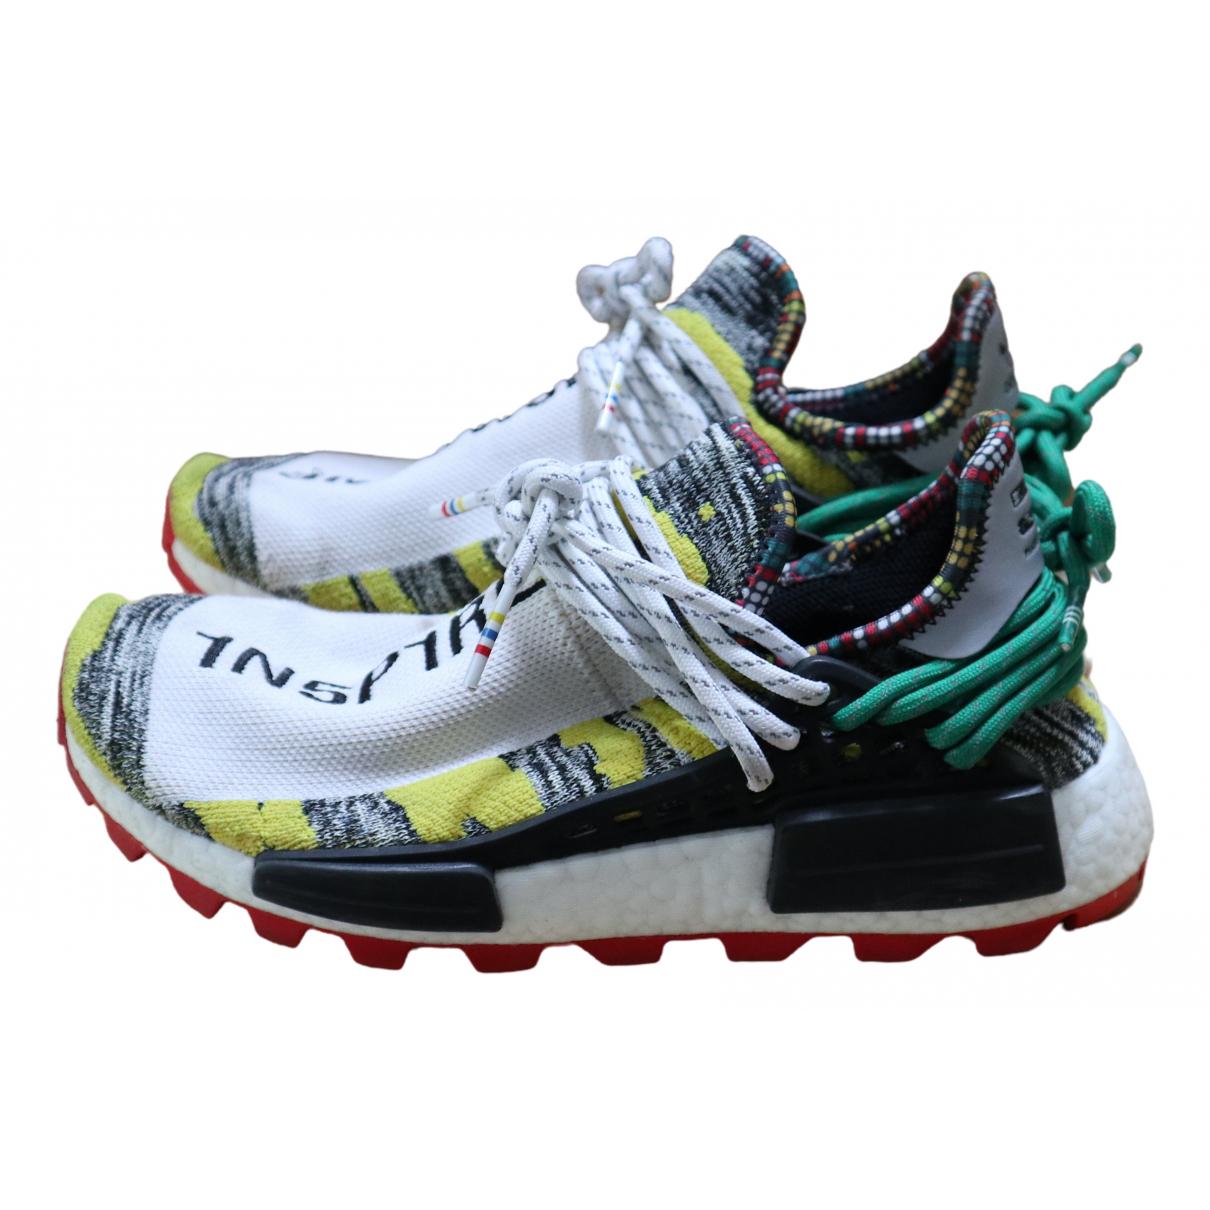 Adidas X Pharrell Williams NMD Hu Multicolour Cloth Trainers for Men 6.5 US